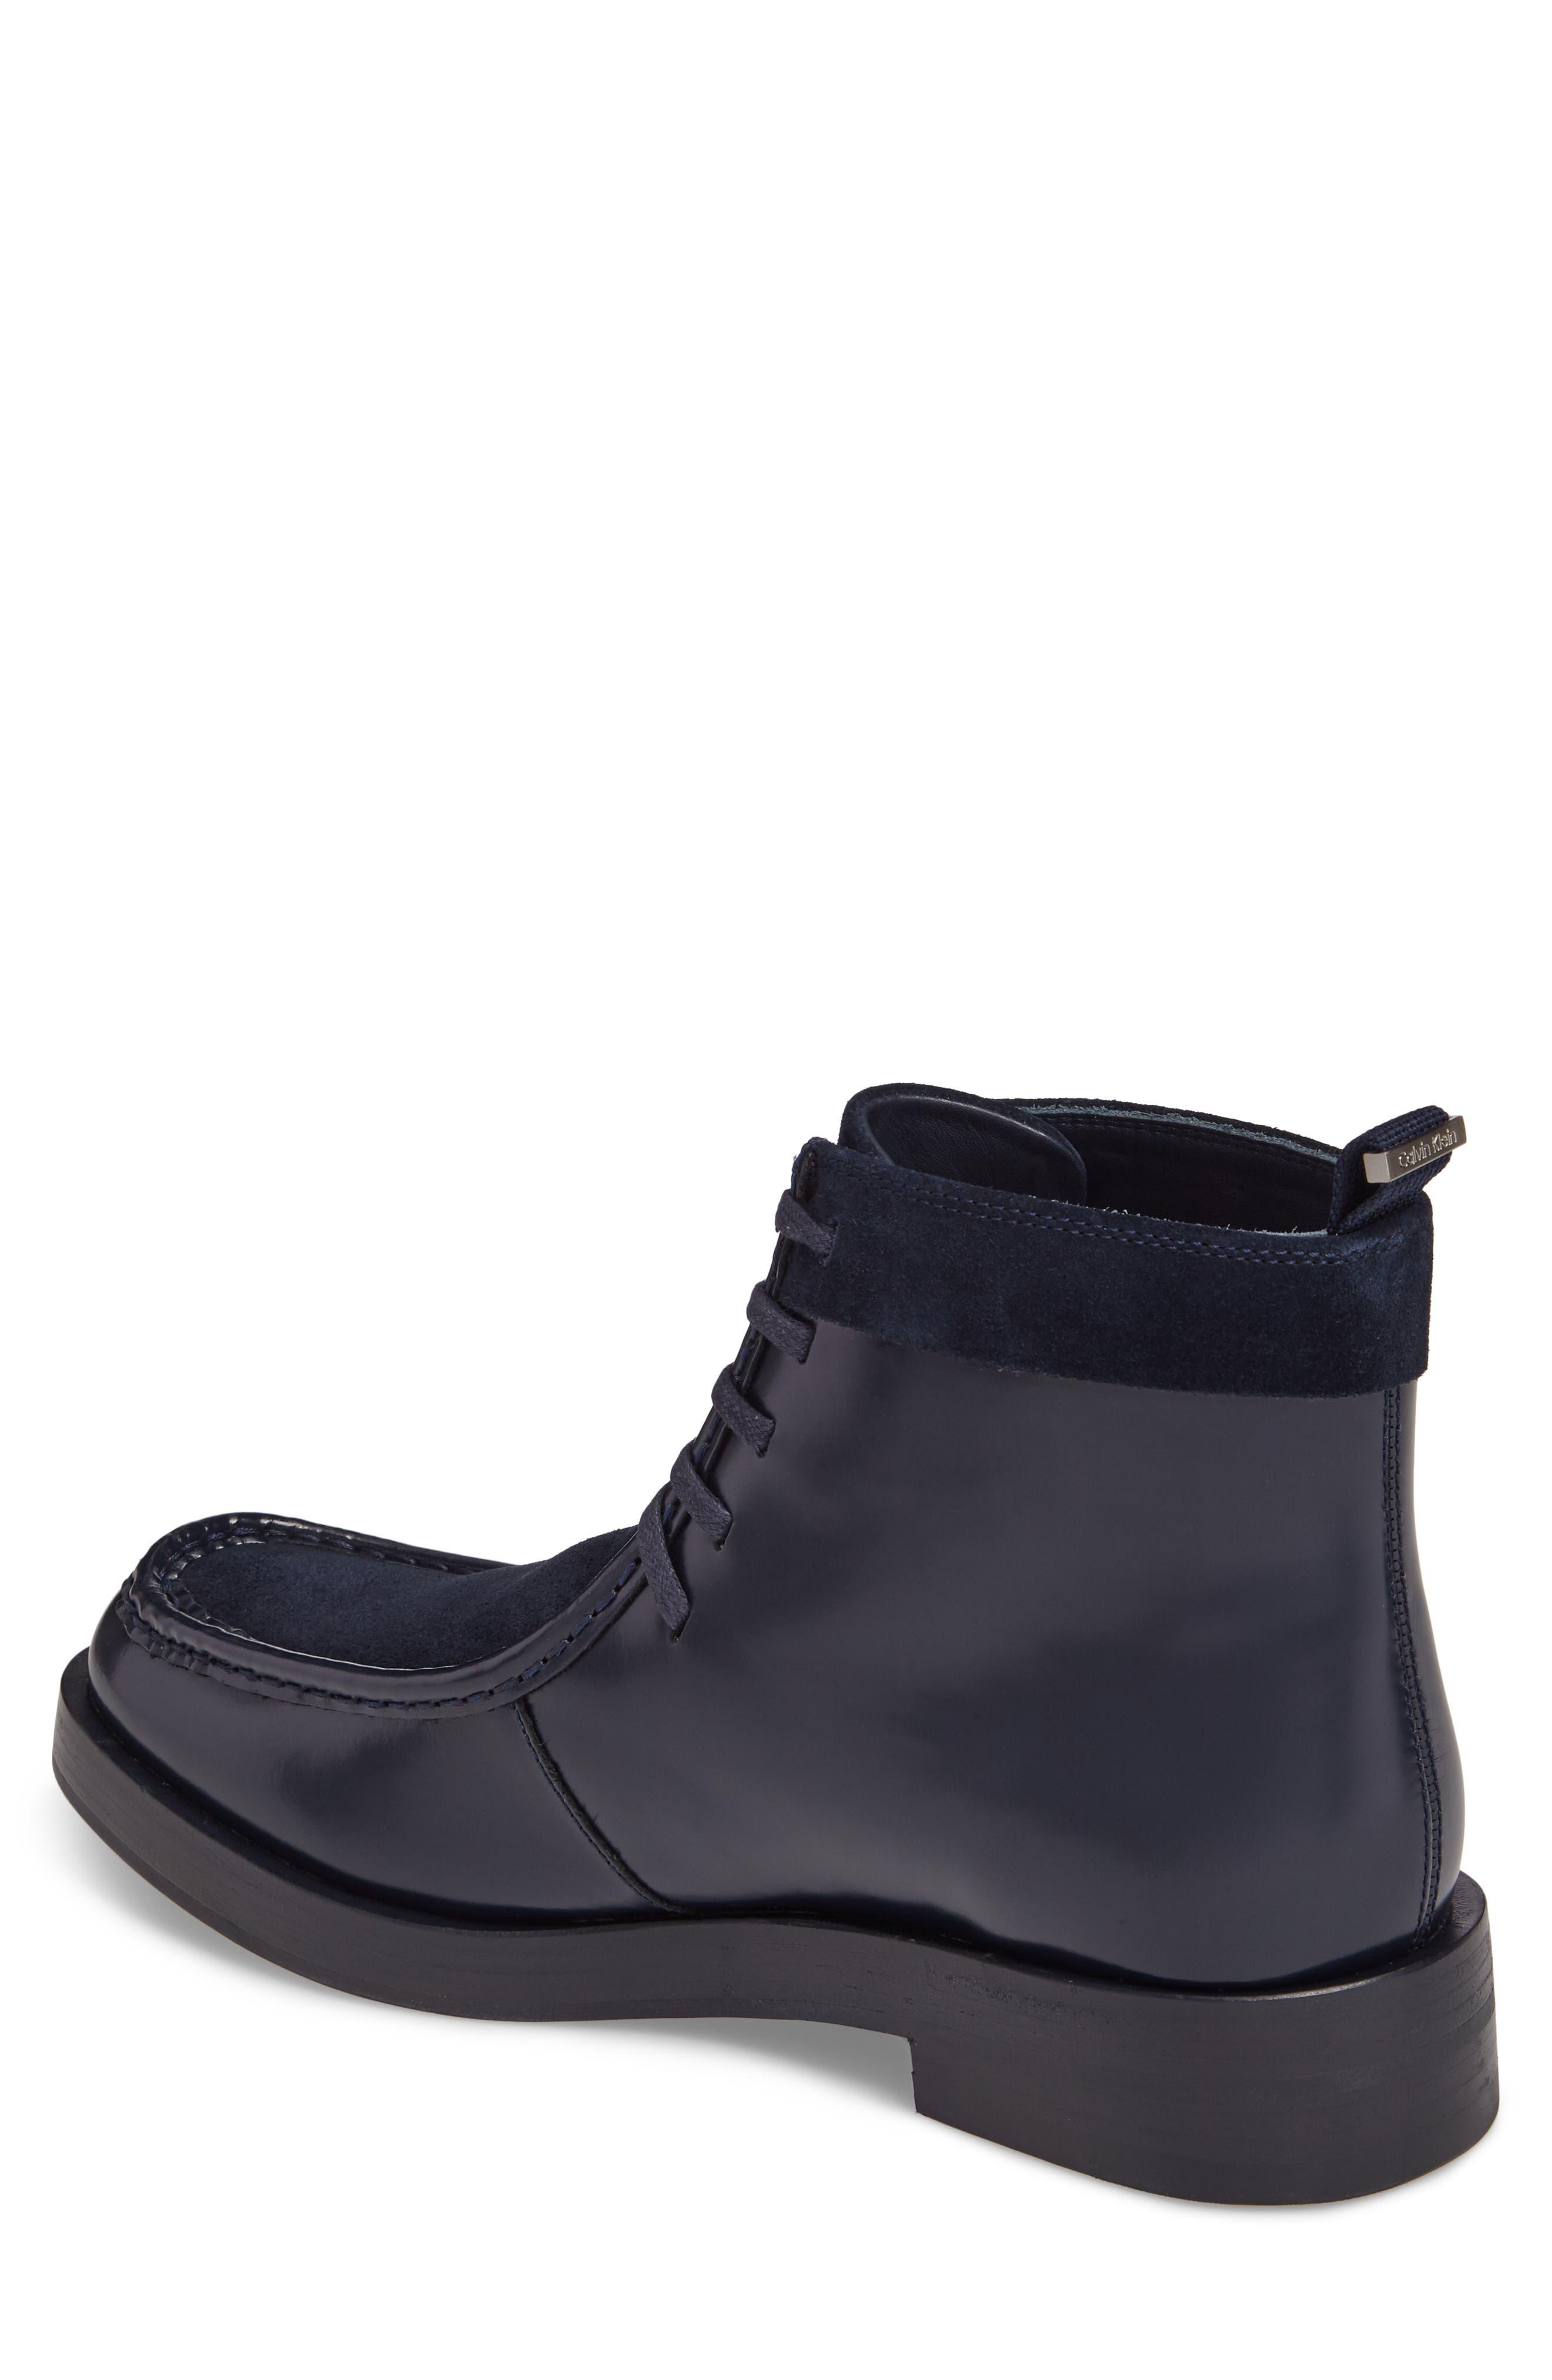 Rafi Moc Toe Boot,                             Alternate thumbnail 2, color,                             Dark Navy Leather